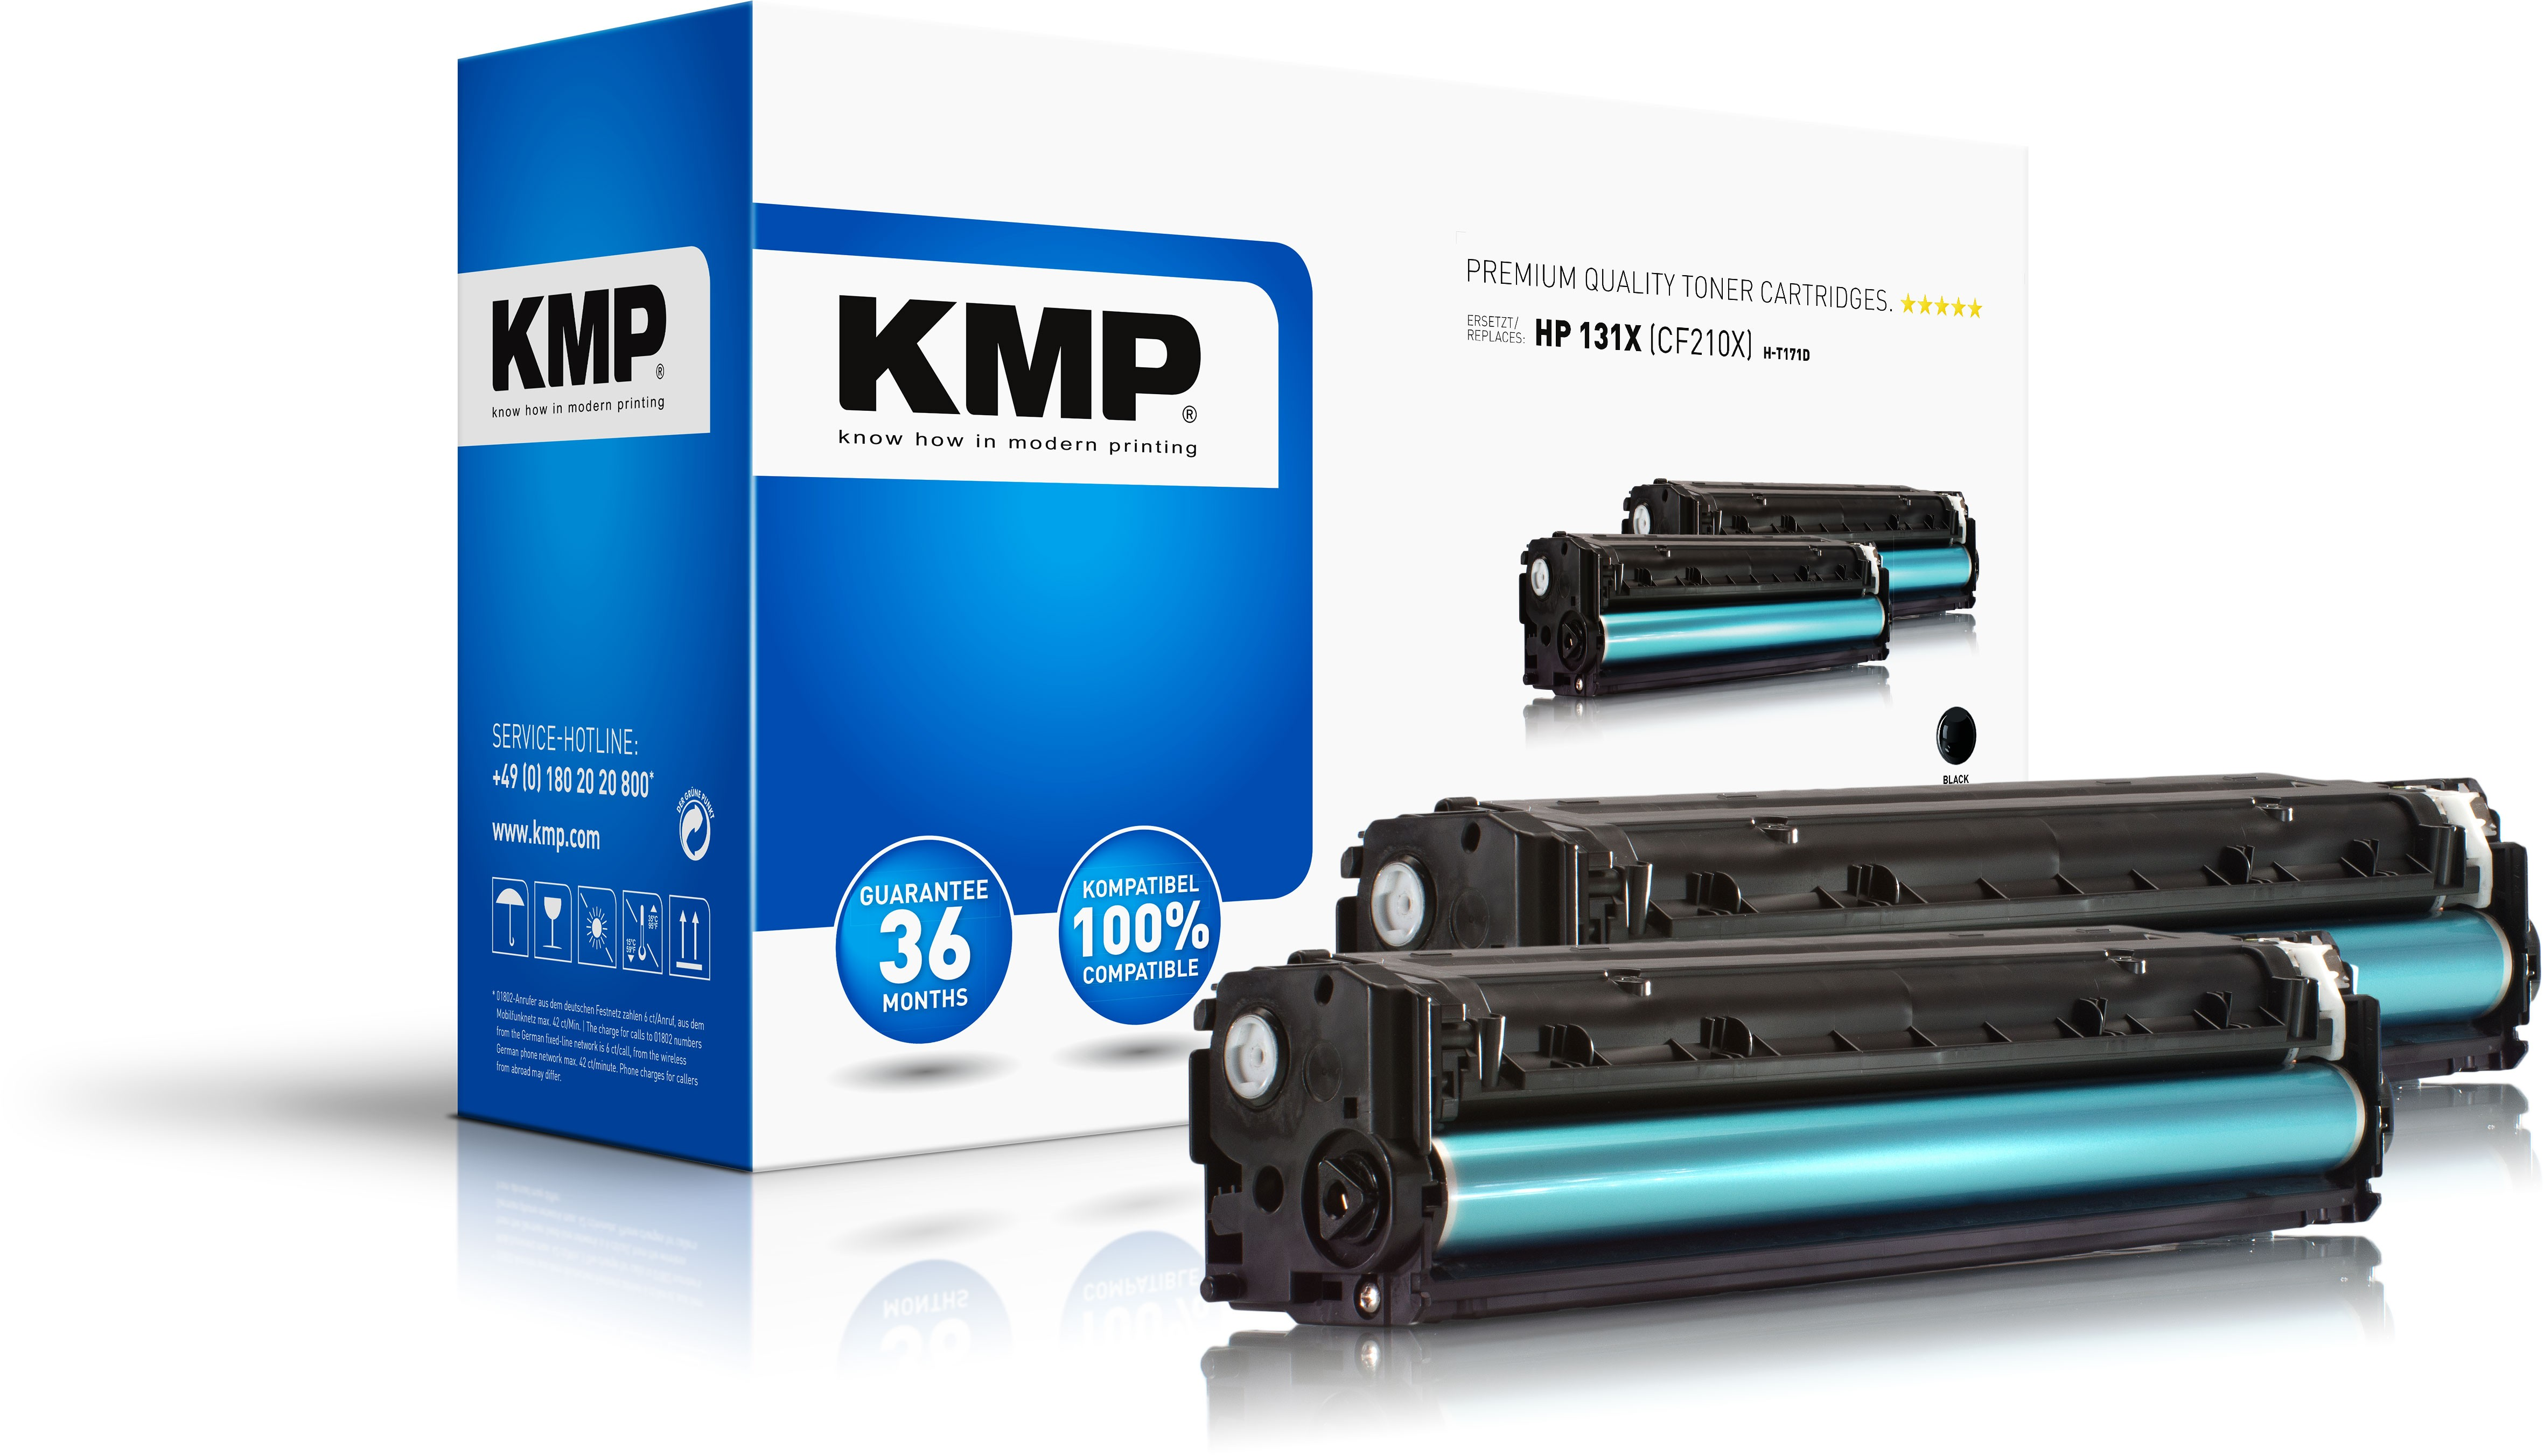 KMP DoppelpackToner H-T171D für HP CF210X Laserjet Pro 200 etc. black